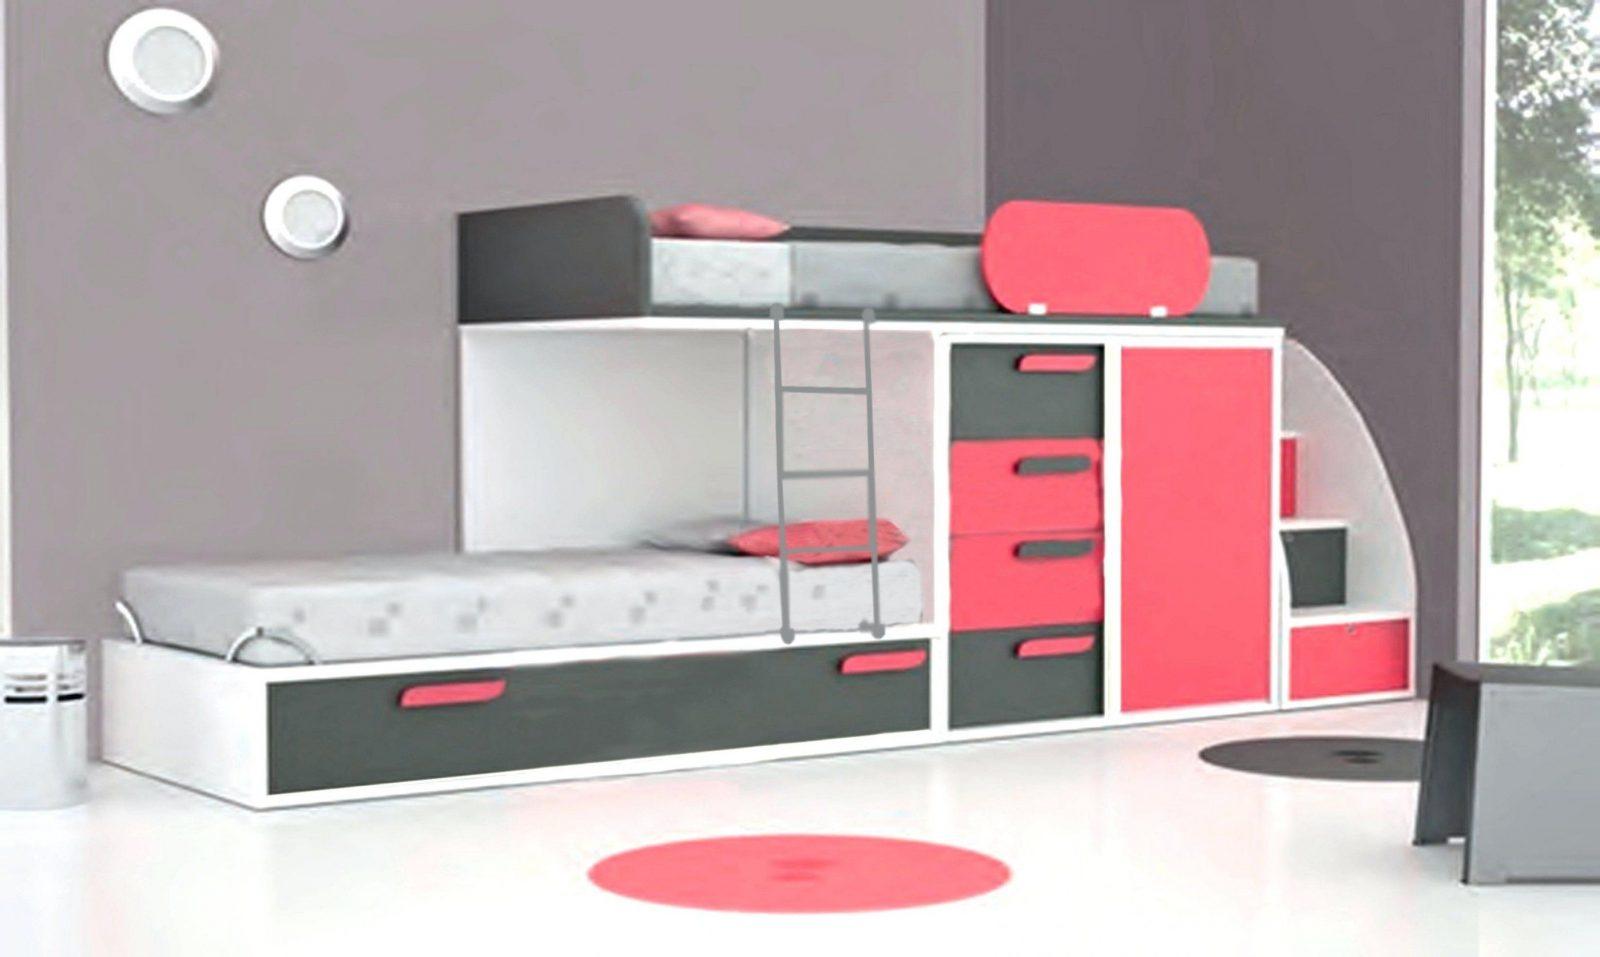 Ikea Etagenbett Weiß Metall : Etagenbett hochbett weiß ikea tromsö svärta eur